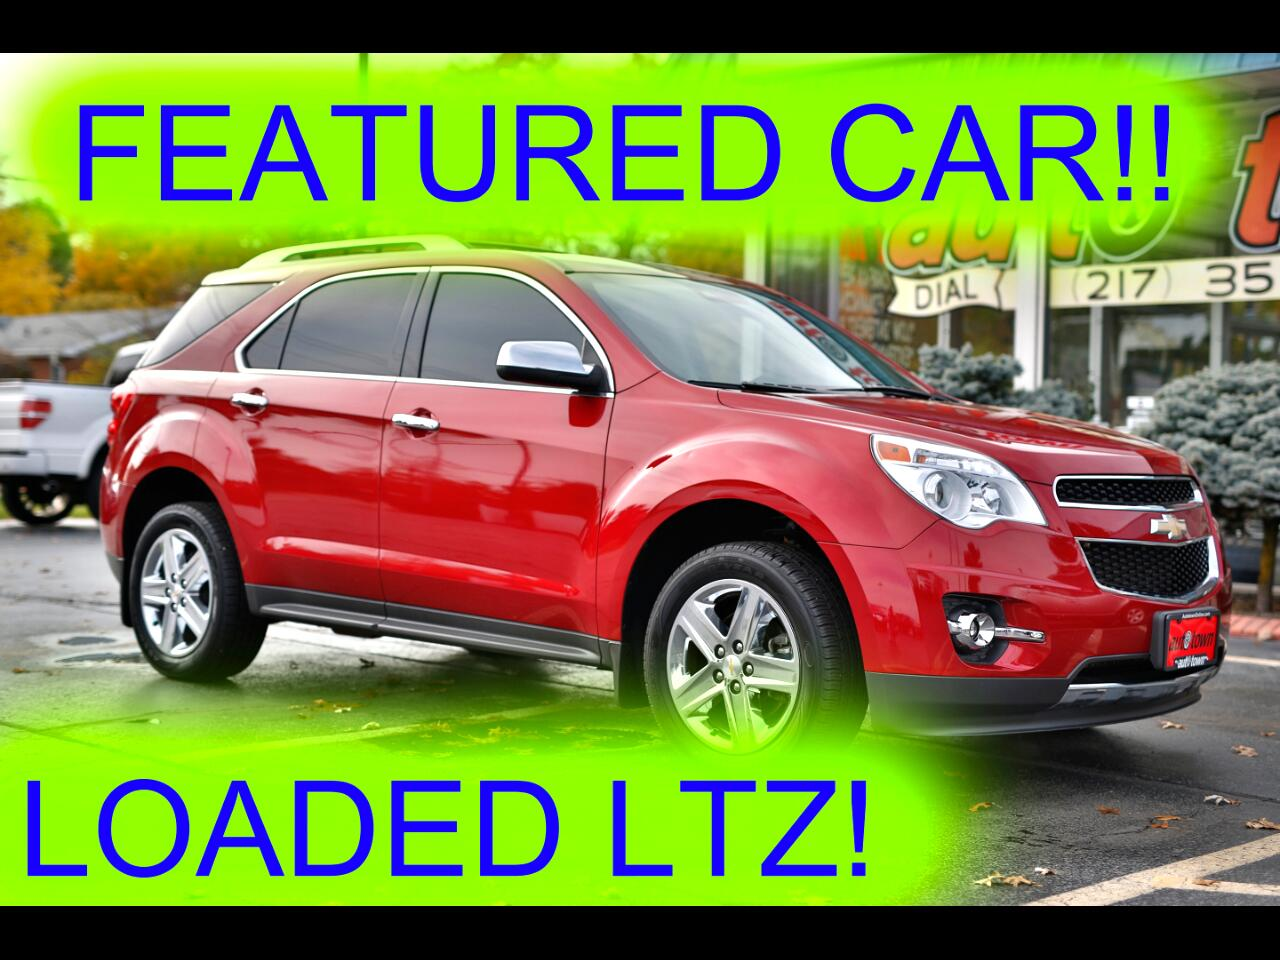 2014 Chevrolet Equinox LTZ 2WD